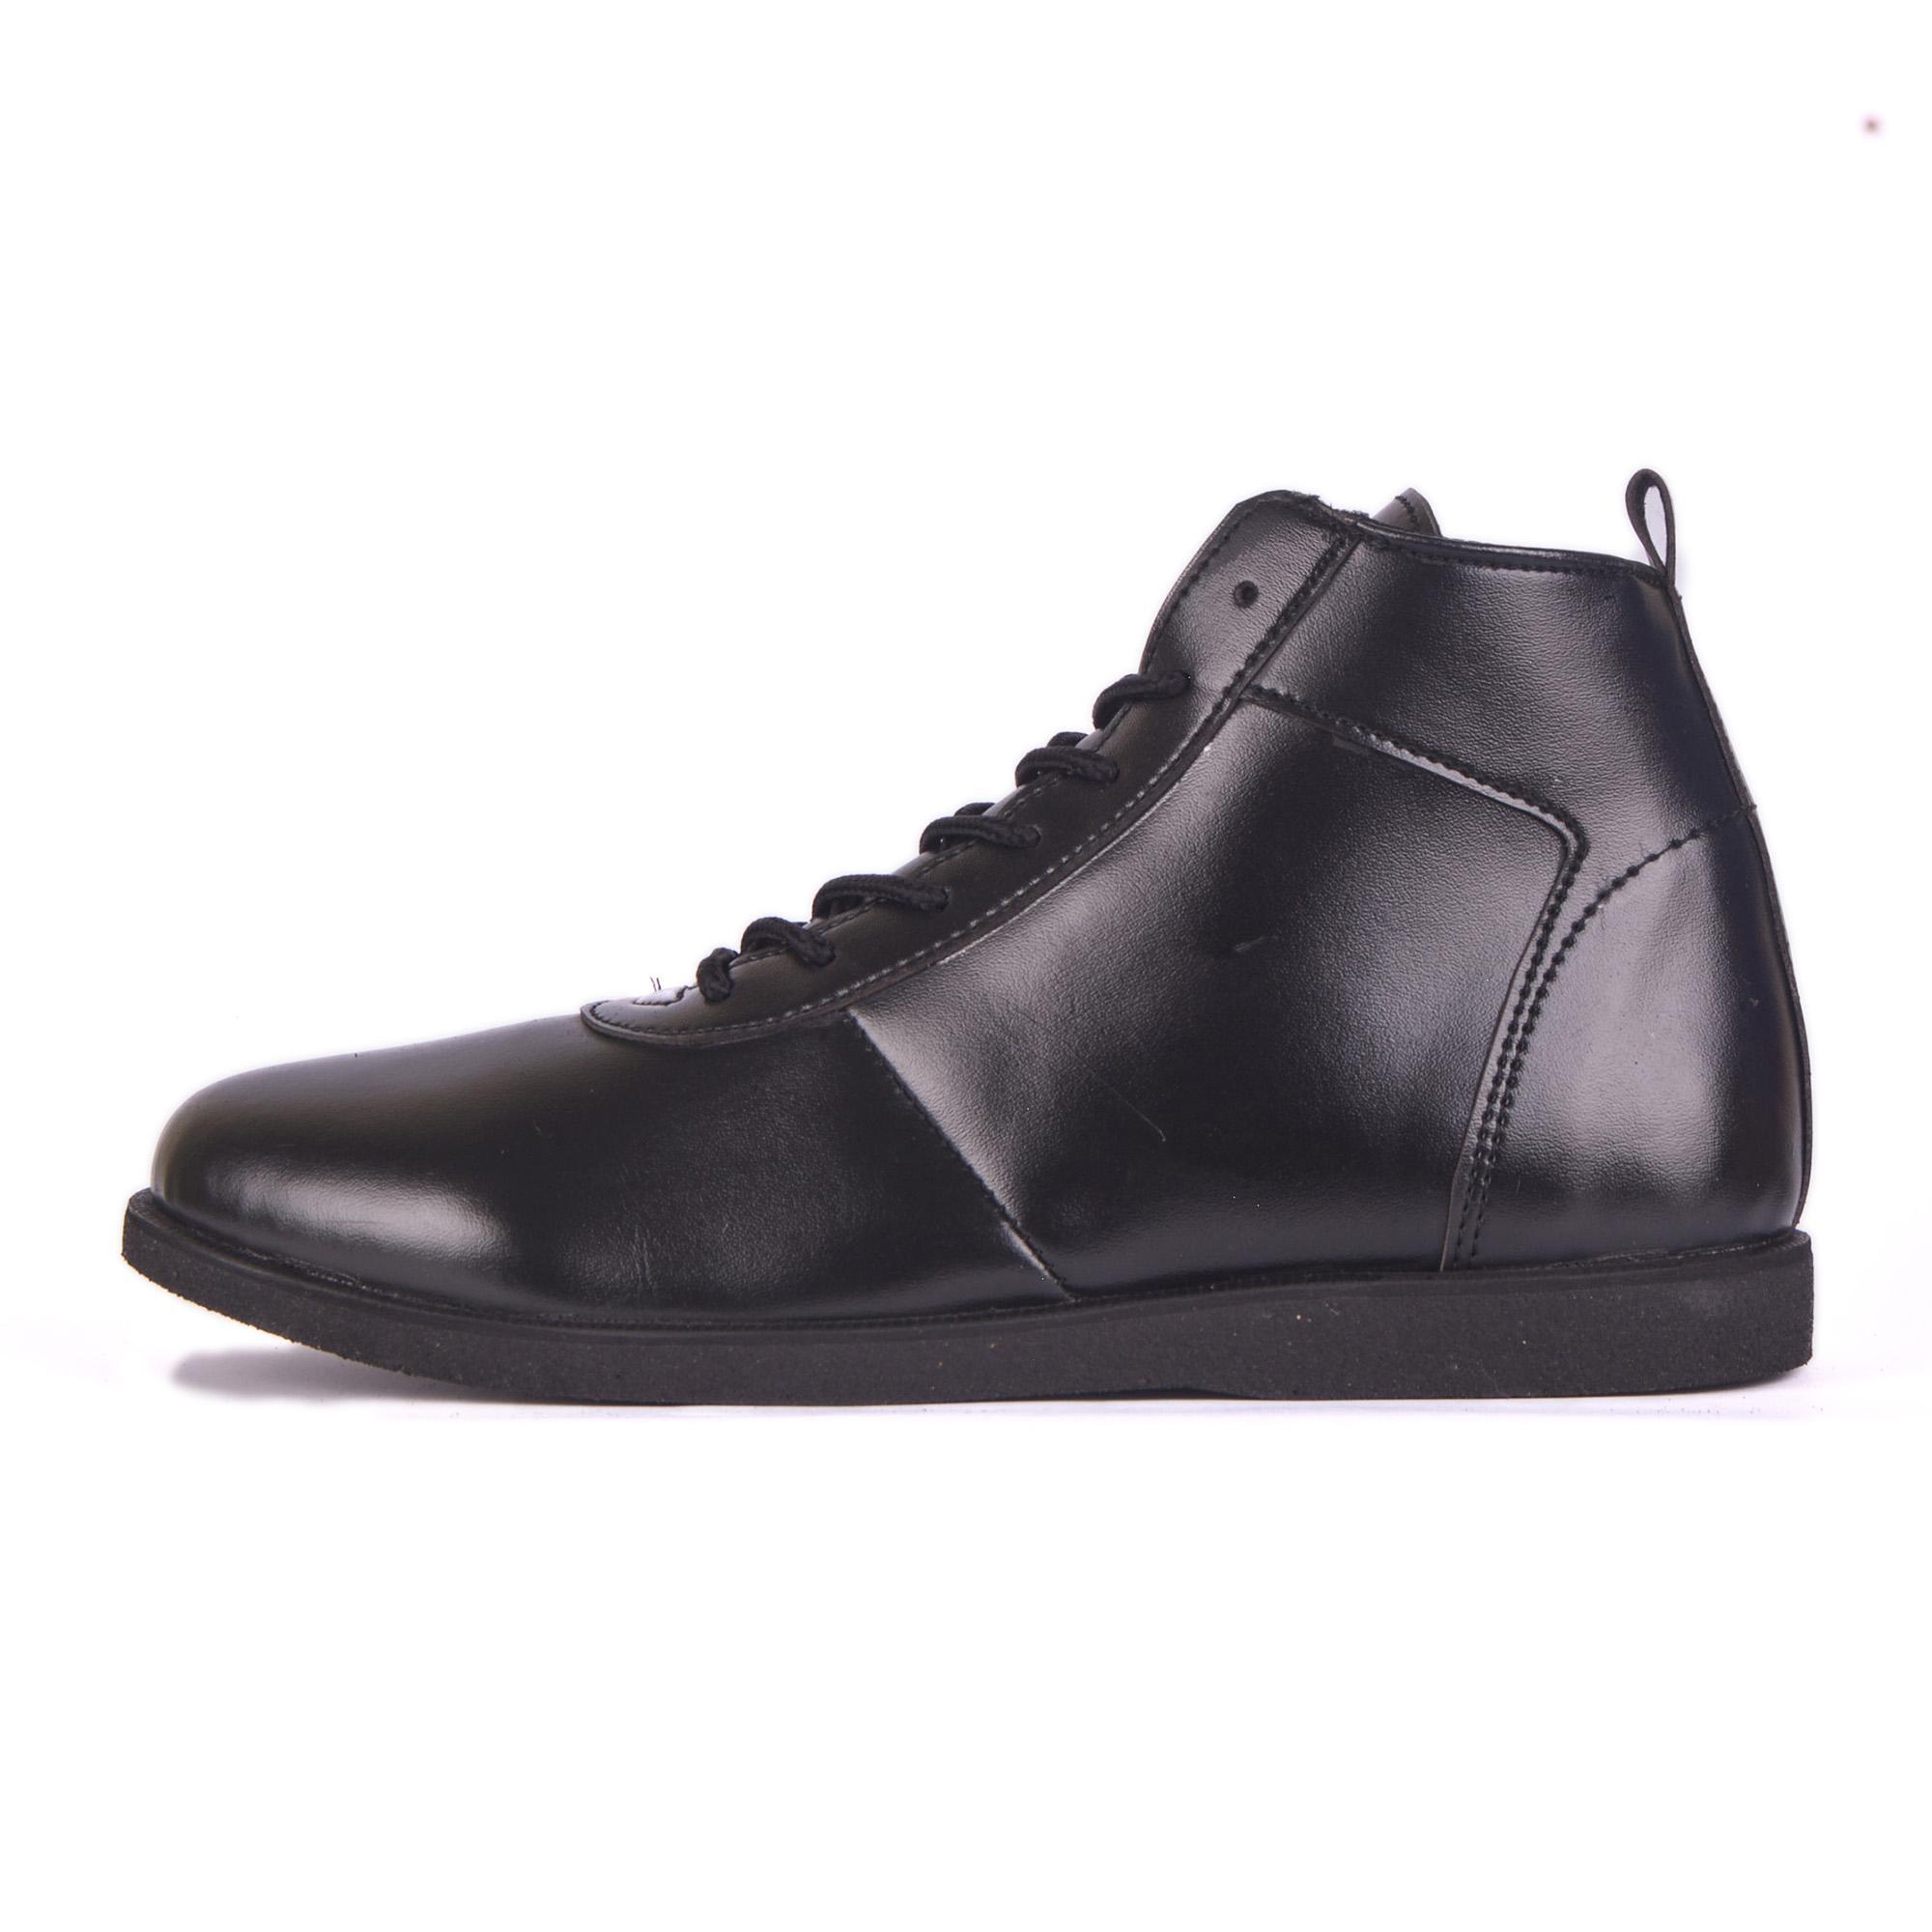 Sepatu pria   sepatu boots   boots klasik   sepatu formal   sepatu kerja    sepatu 4882394f9e